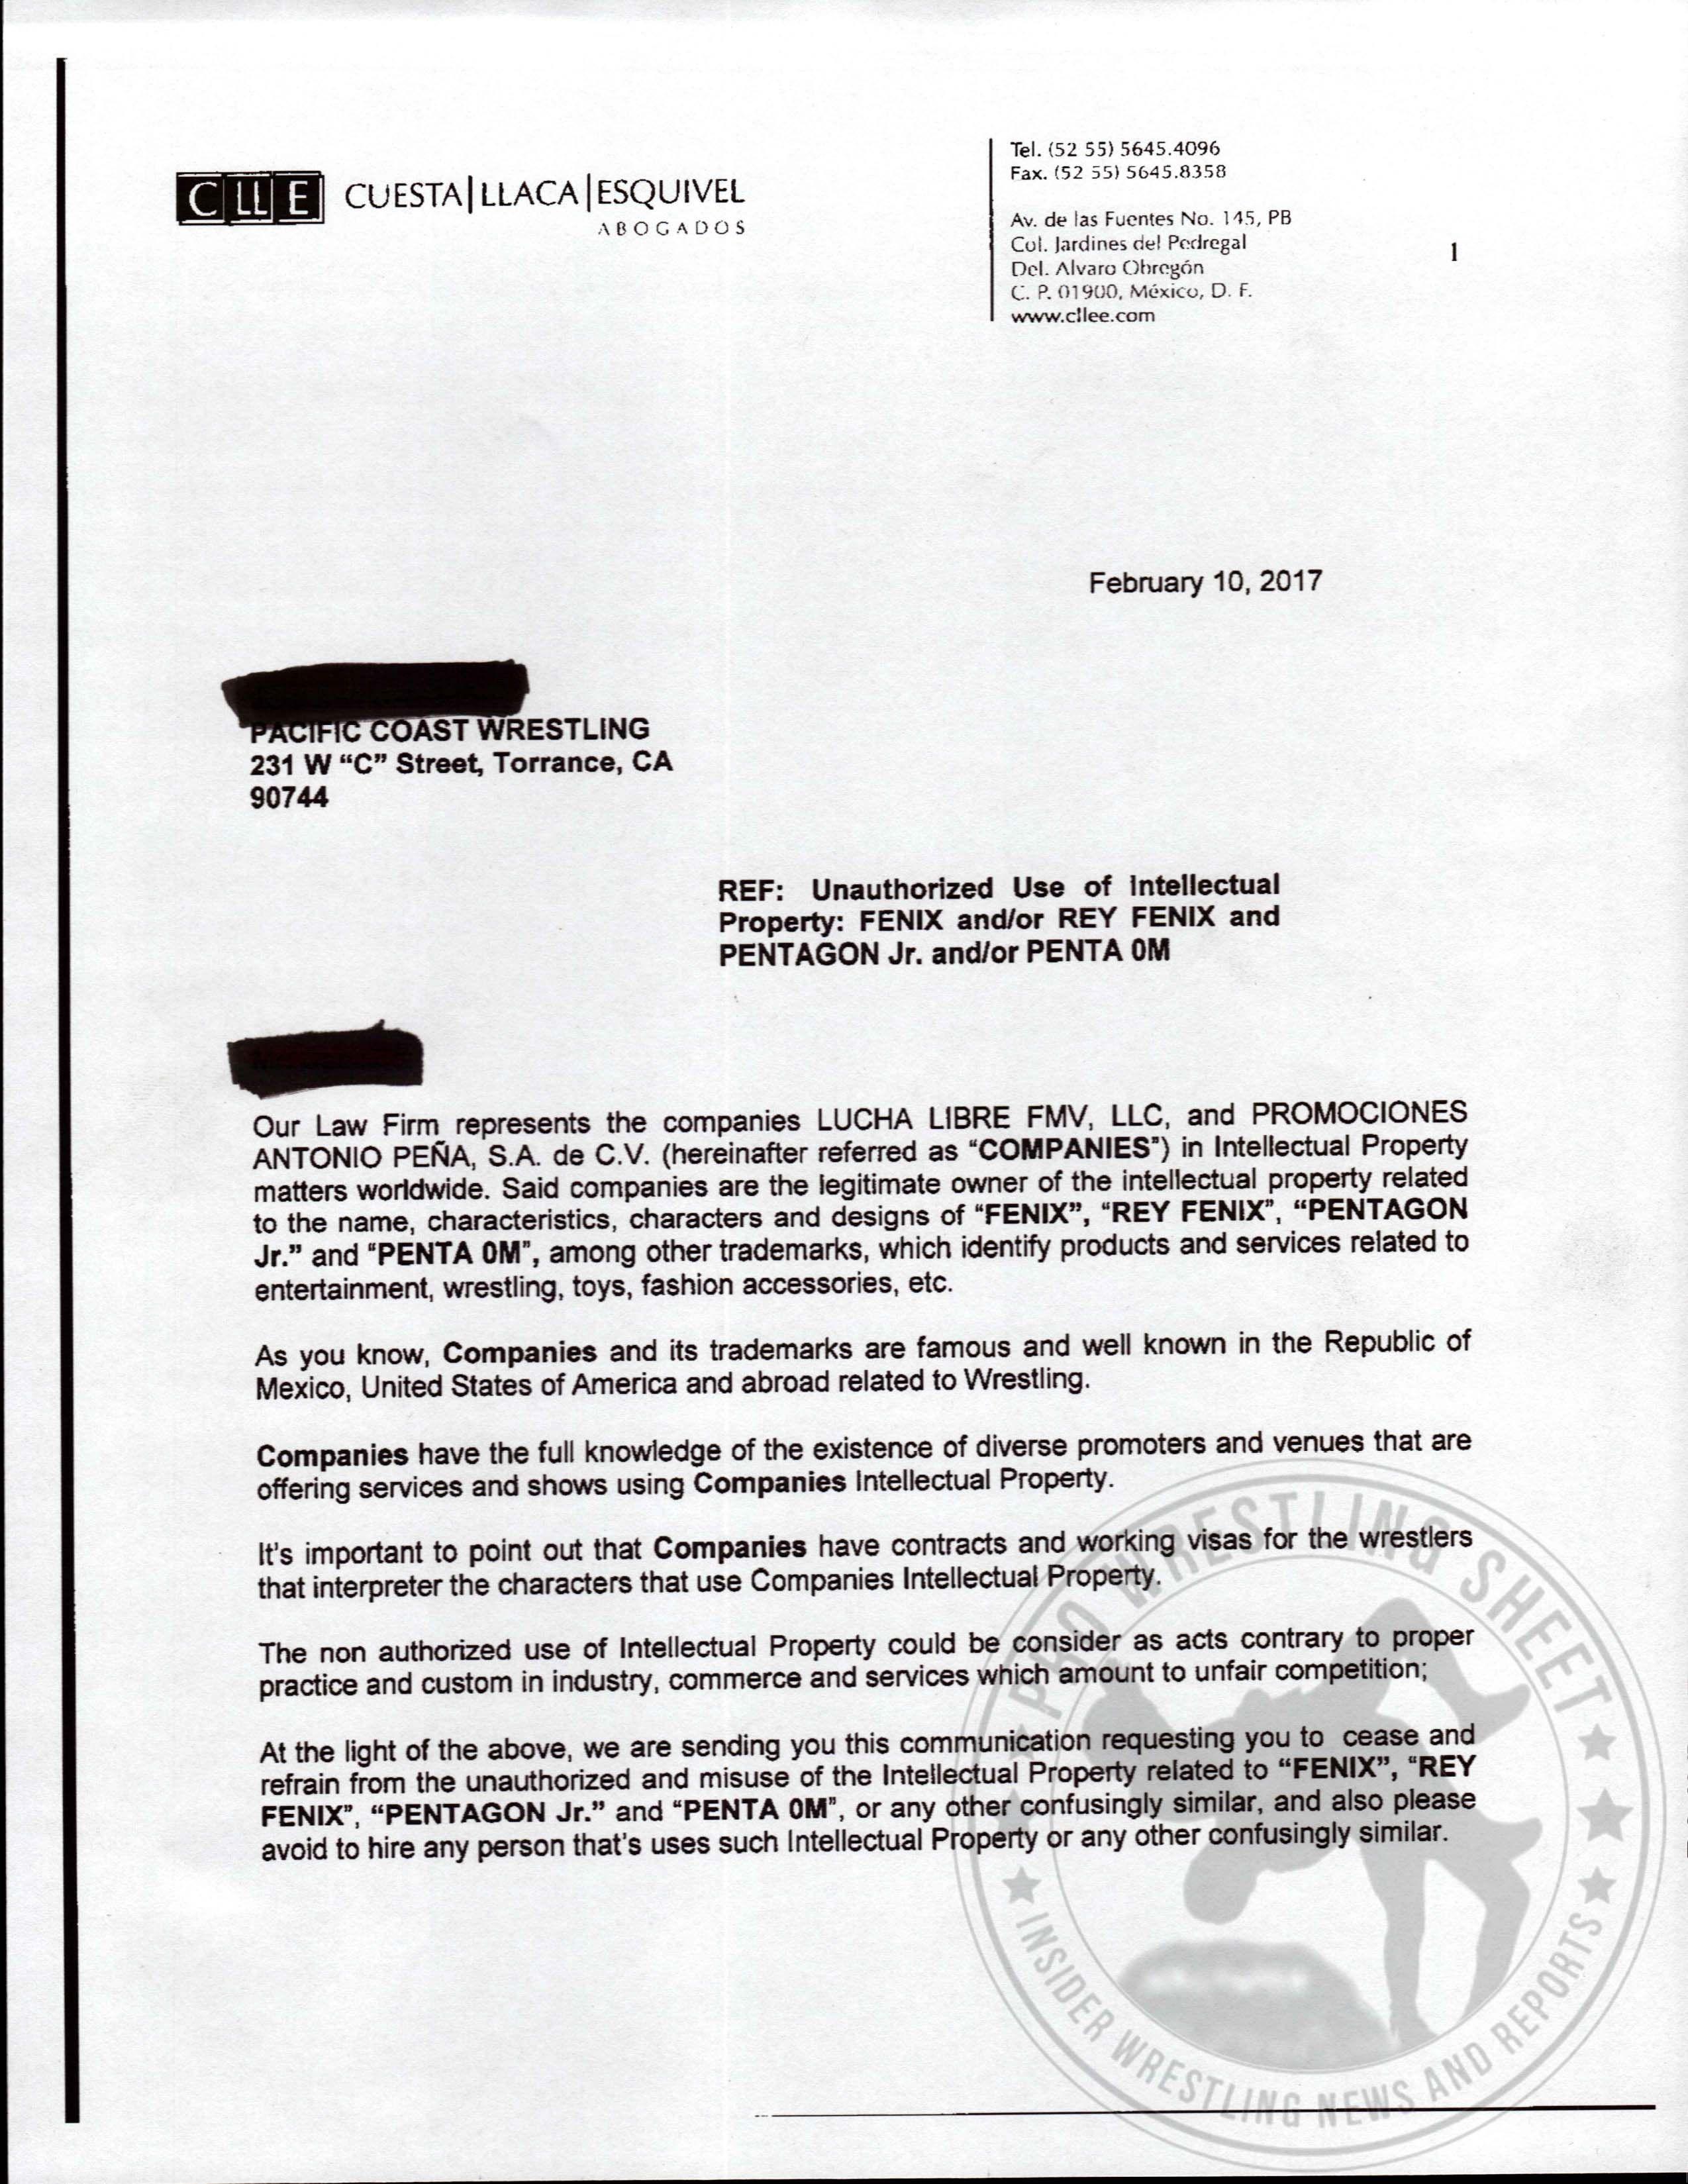 PCW / AAA Legal Letters | Pro Wrestling Sheet | Insider Wrestling